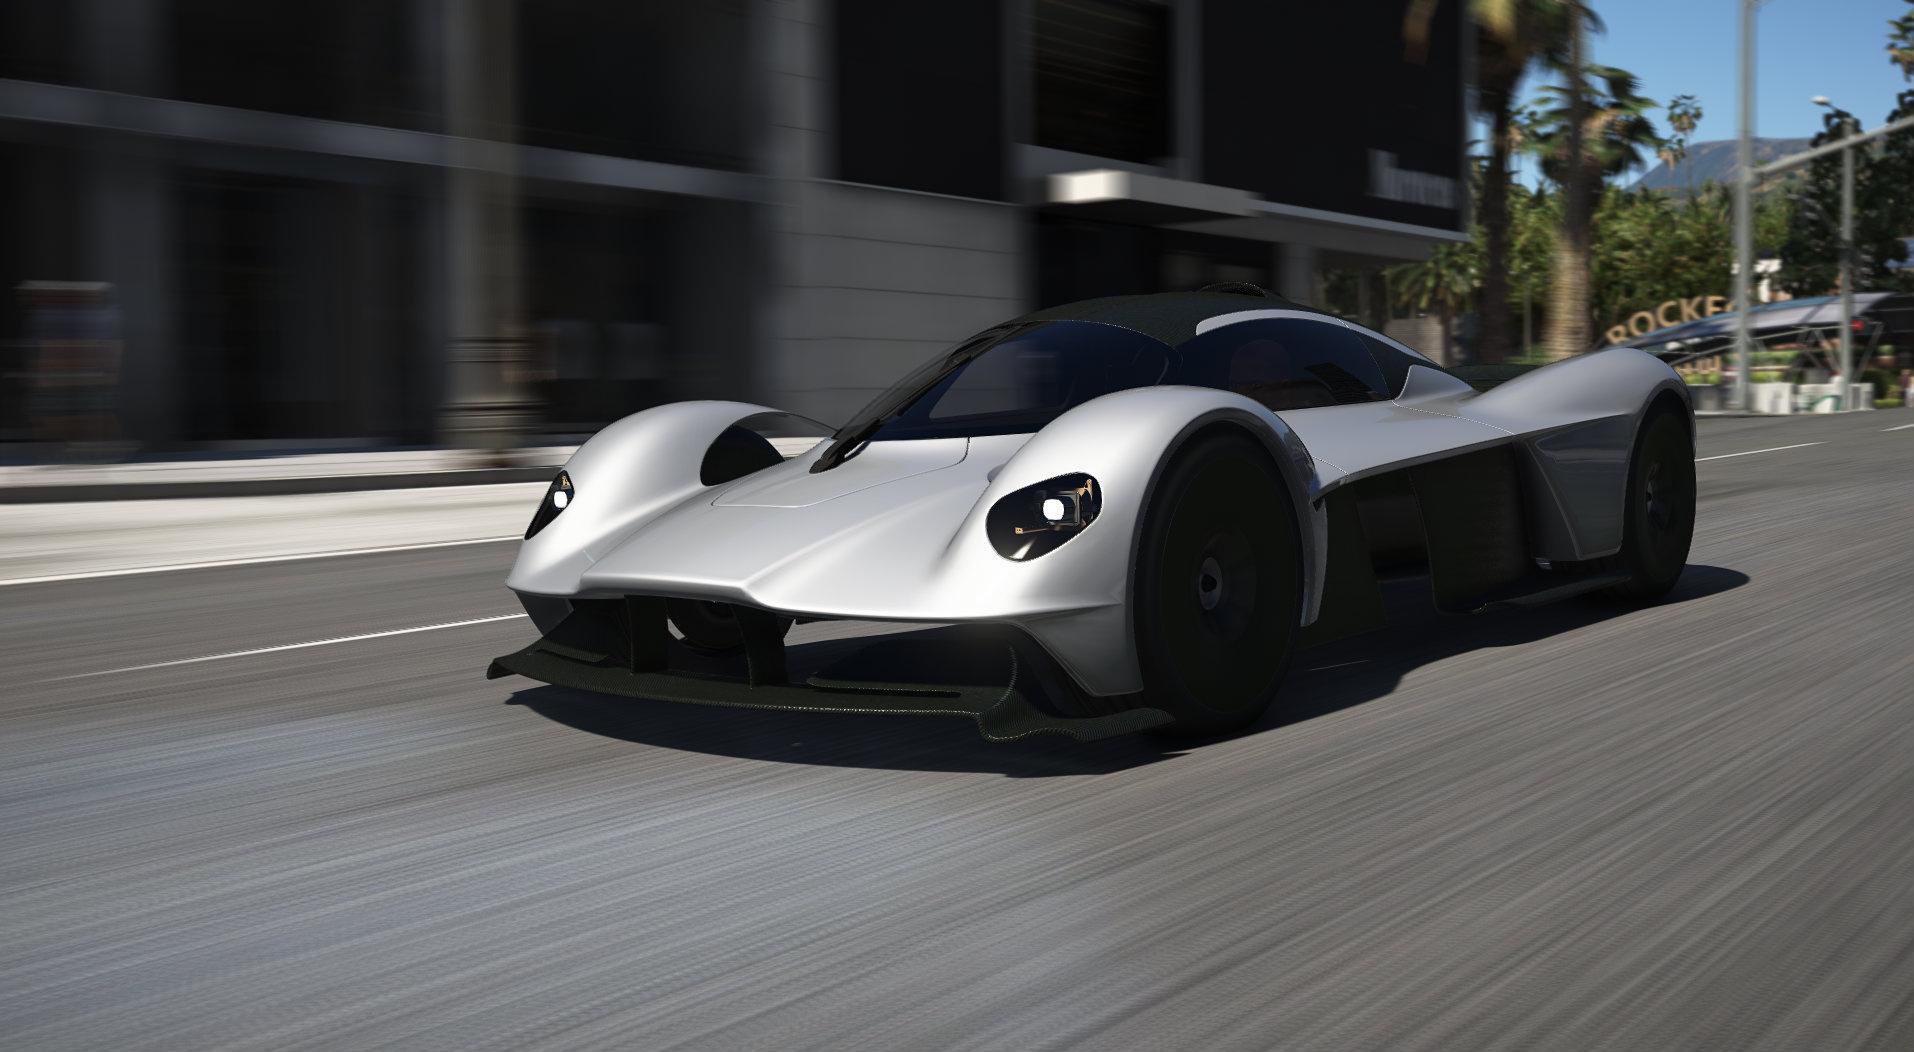 Aston Martin Valkyrie 2018 Add On Gta5 Mods Com